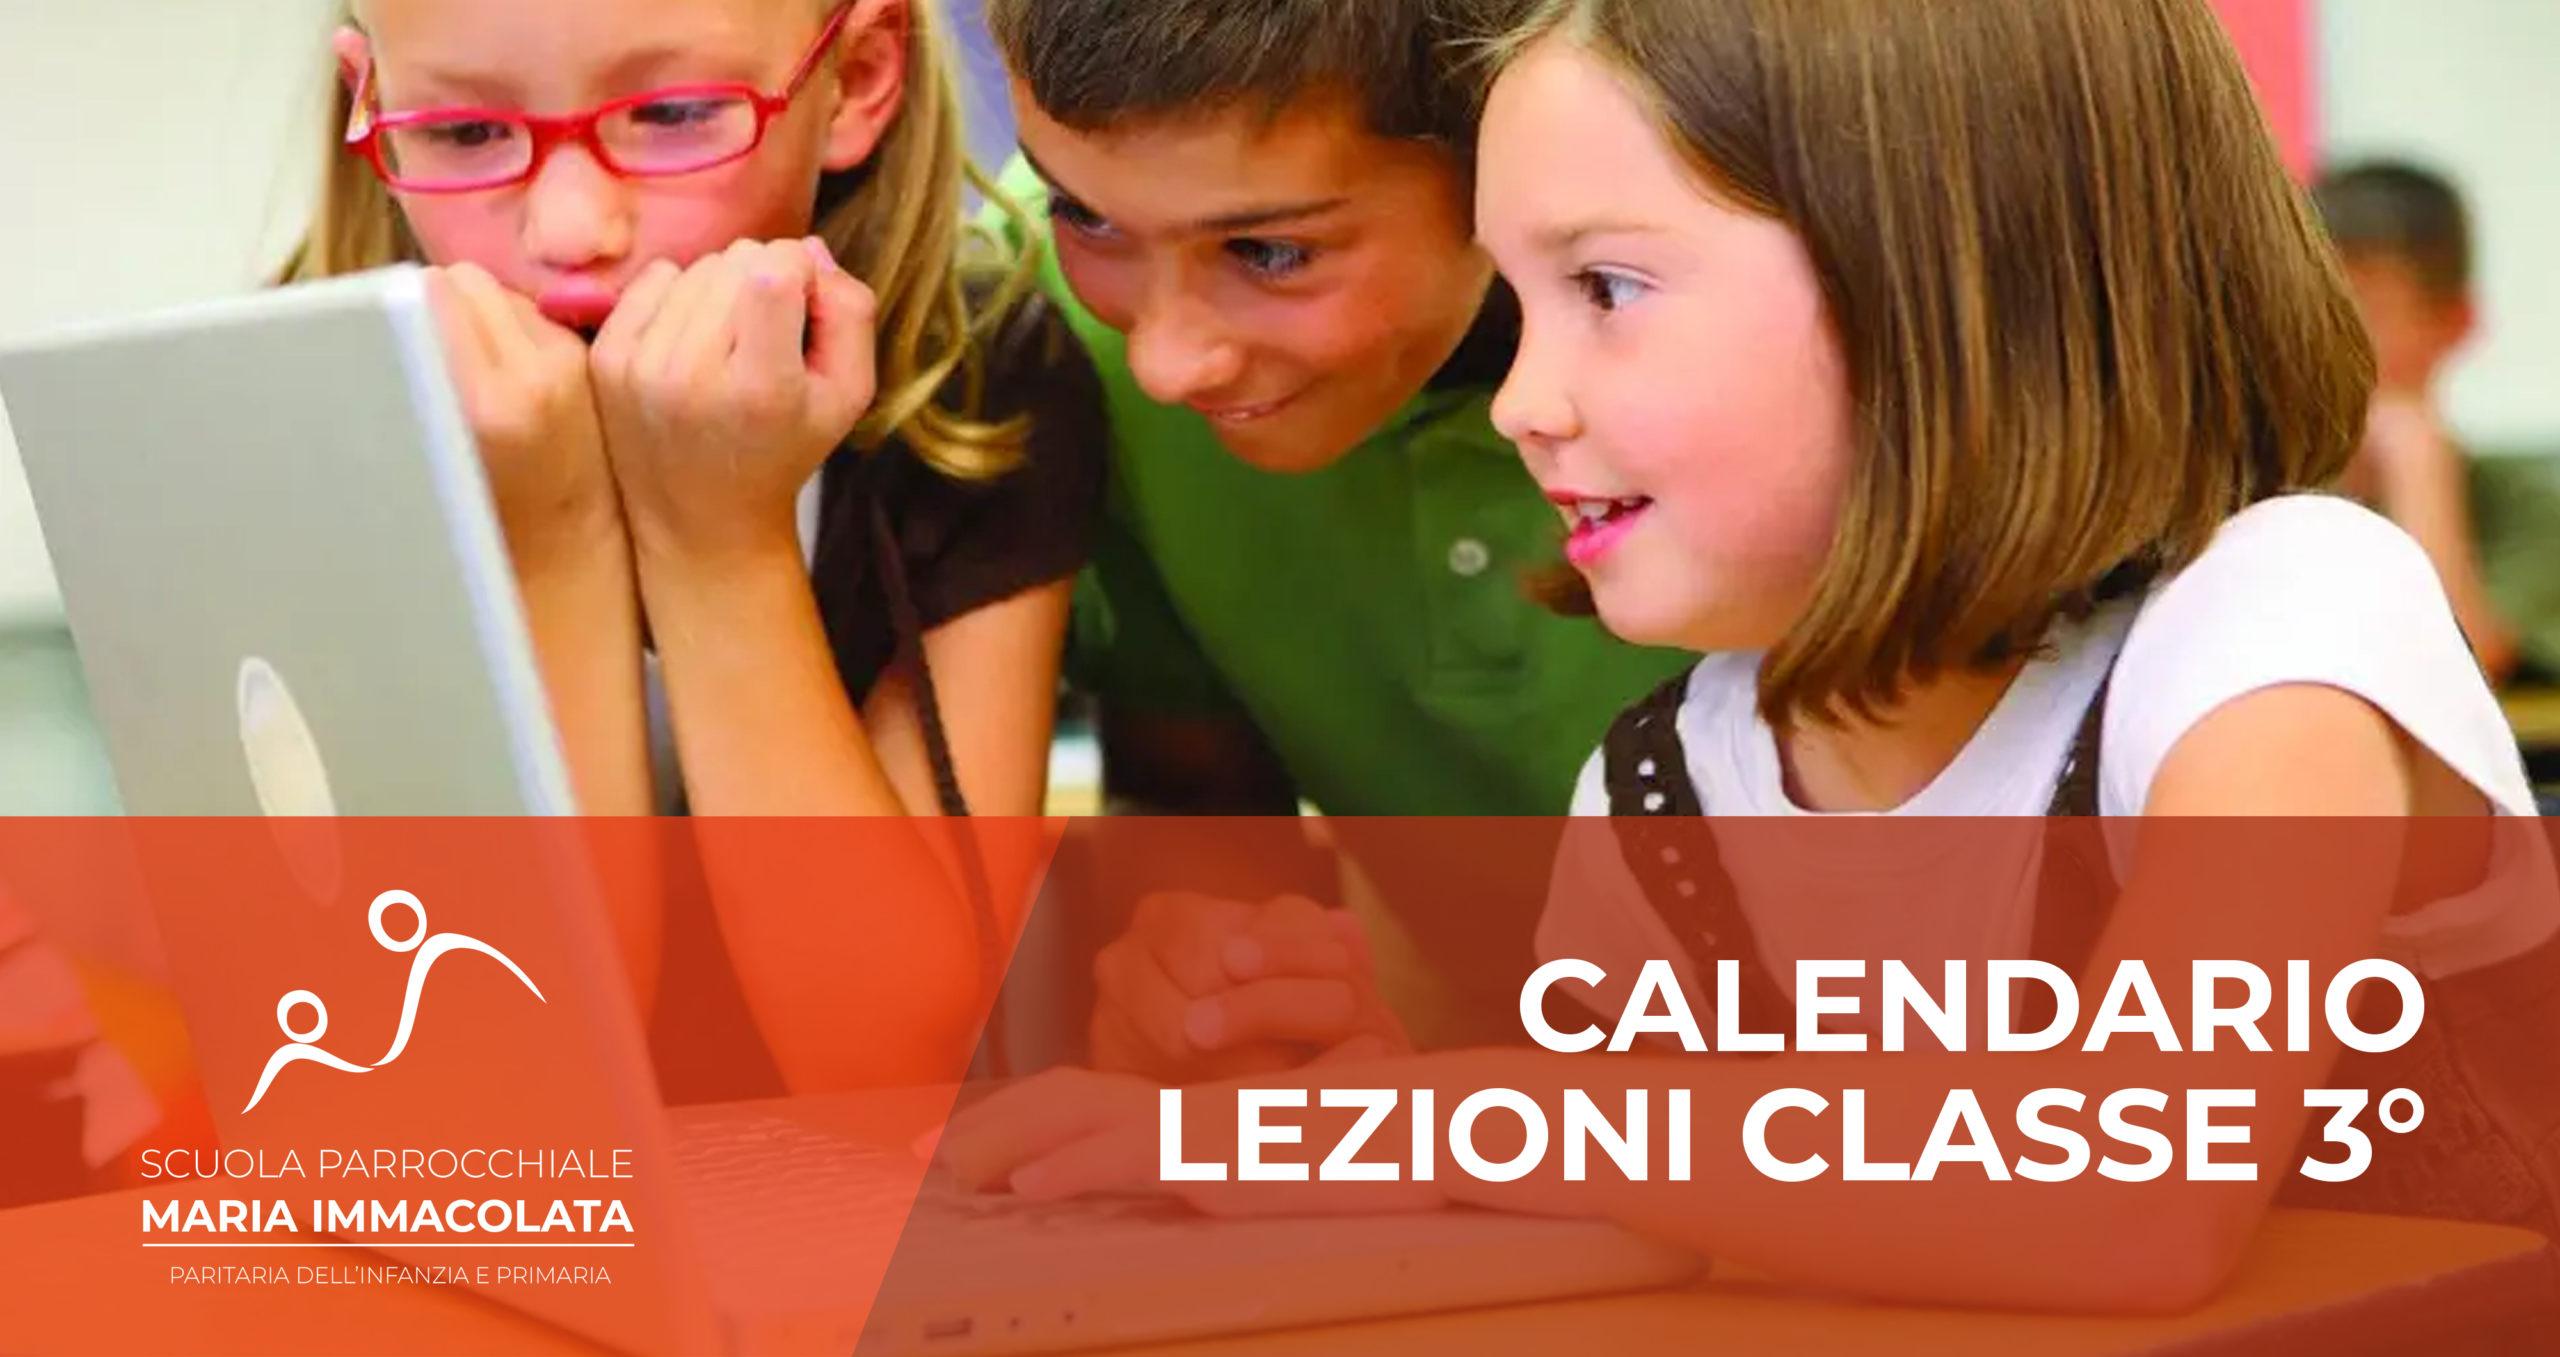 Calendario lezioni durante l'Emergenza Coronavirus – Classe 3